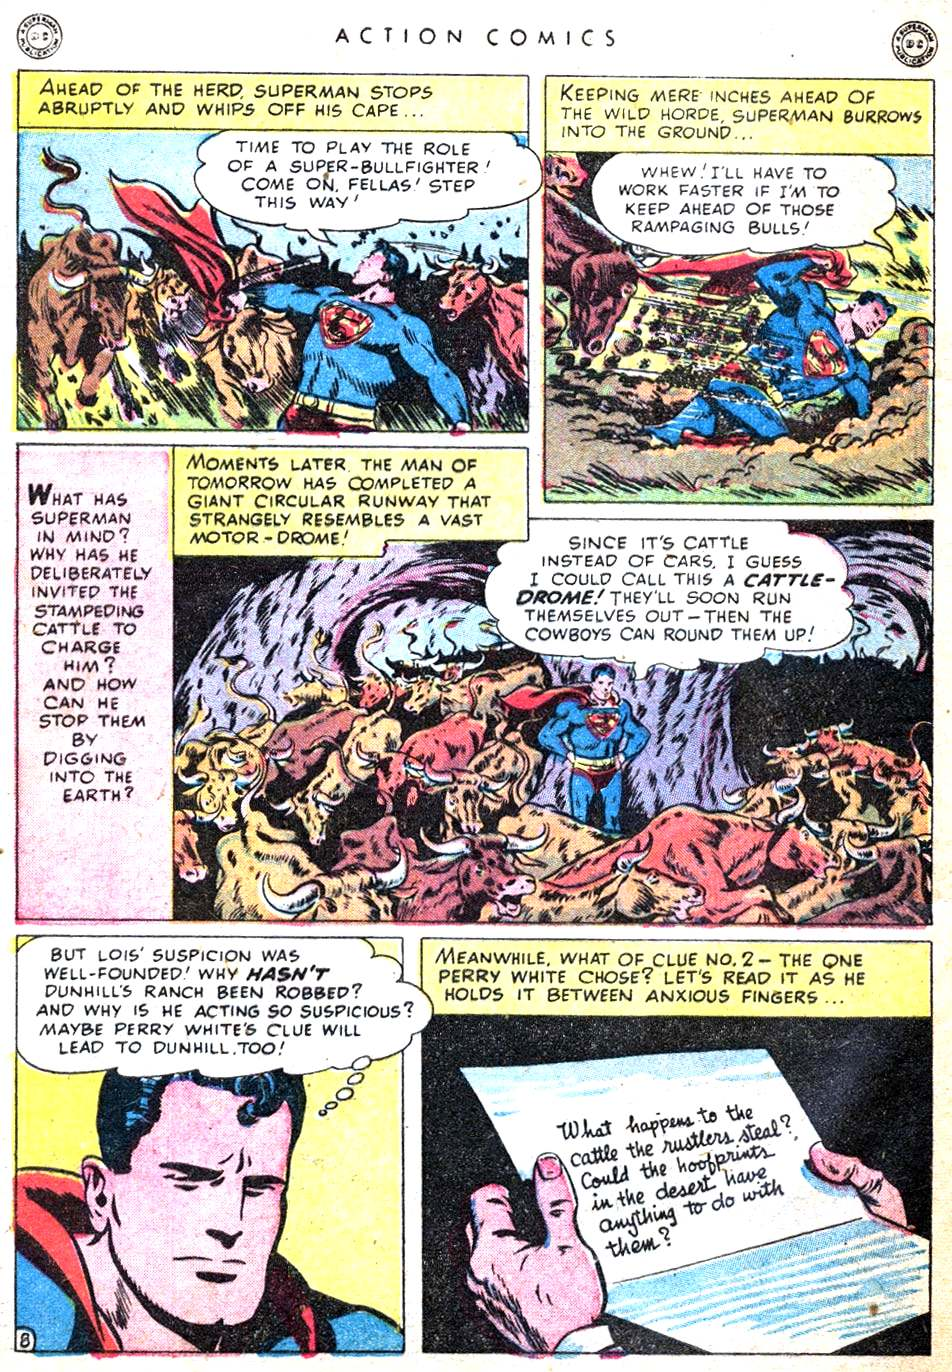 Action Comics (1938) 134 Page 9